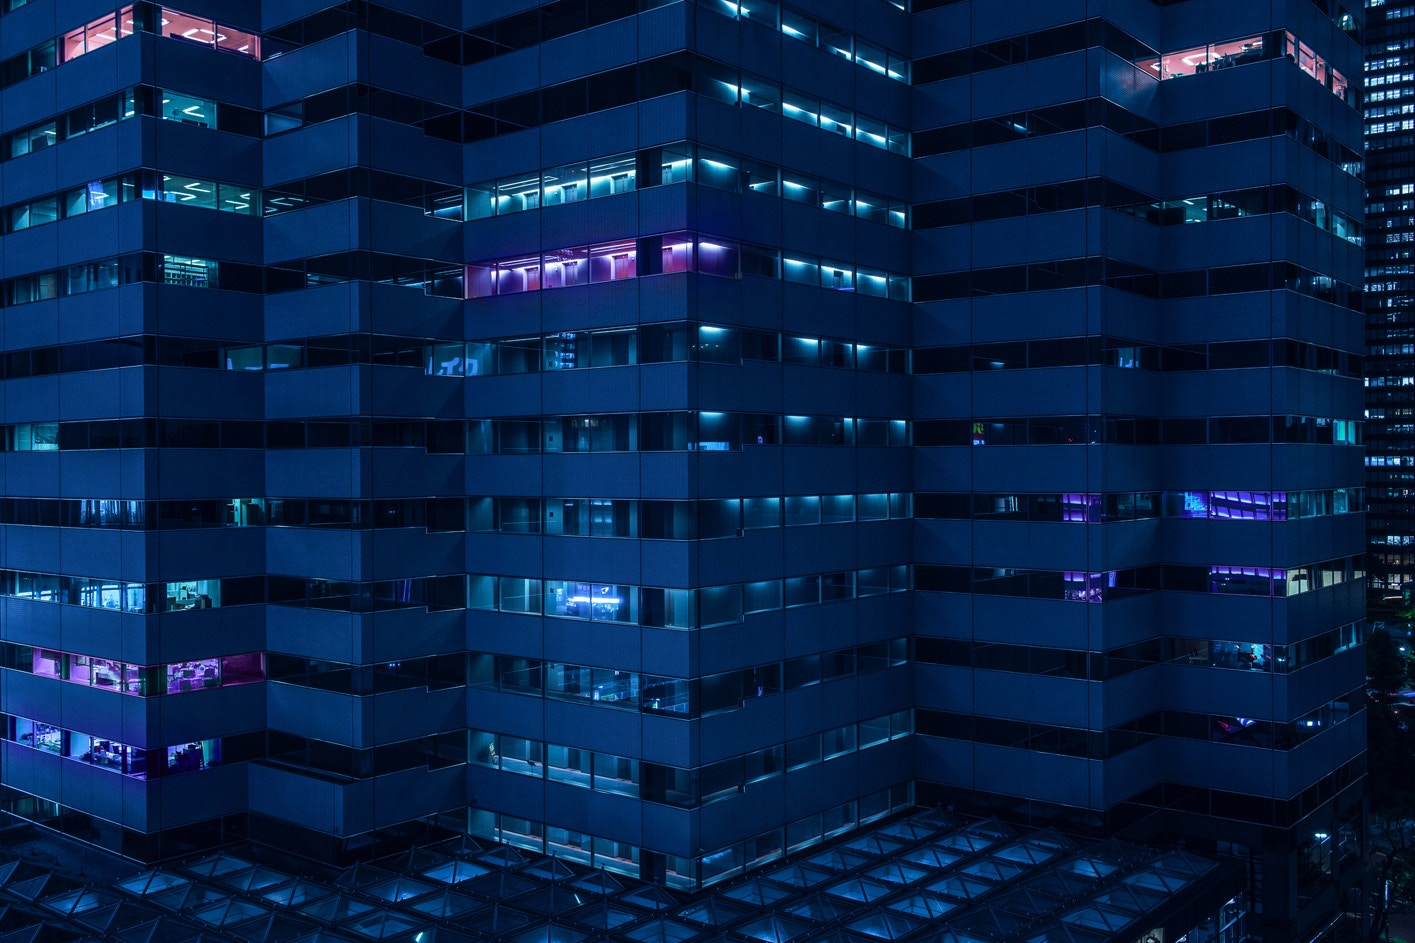 tom-blachford-nihon-noir-tokyo-photography-11.jpg